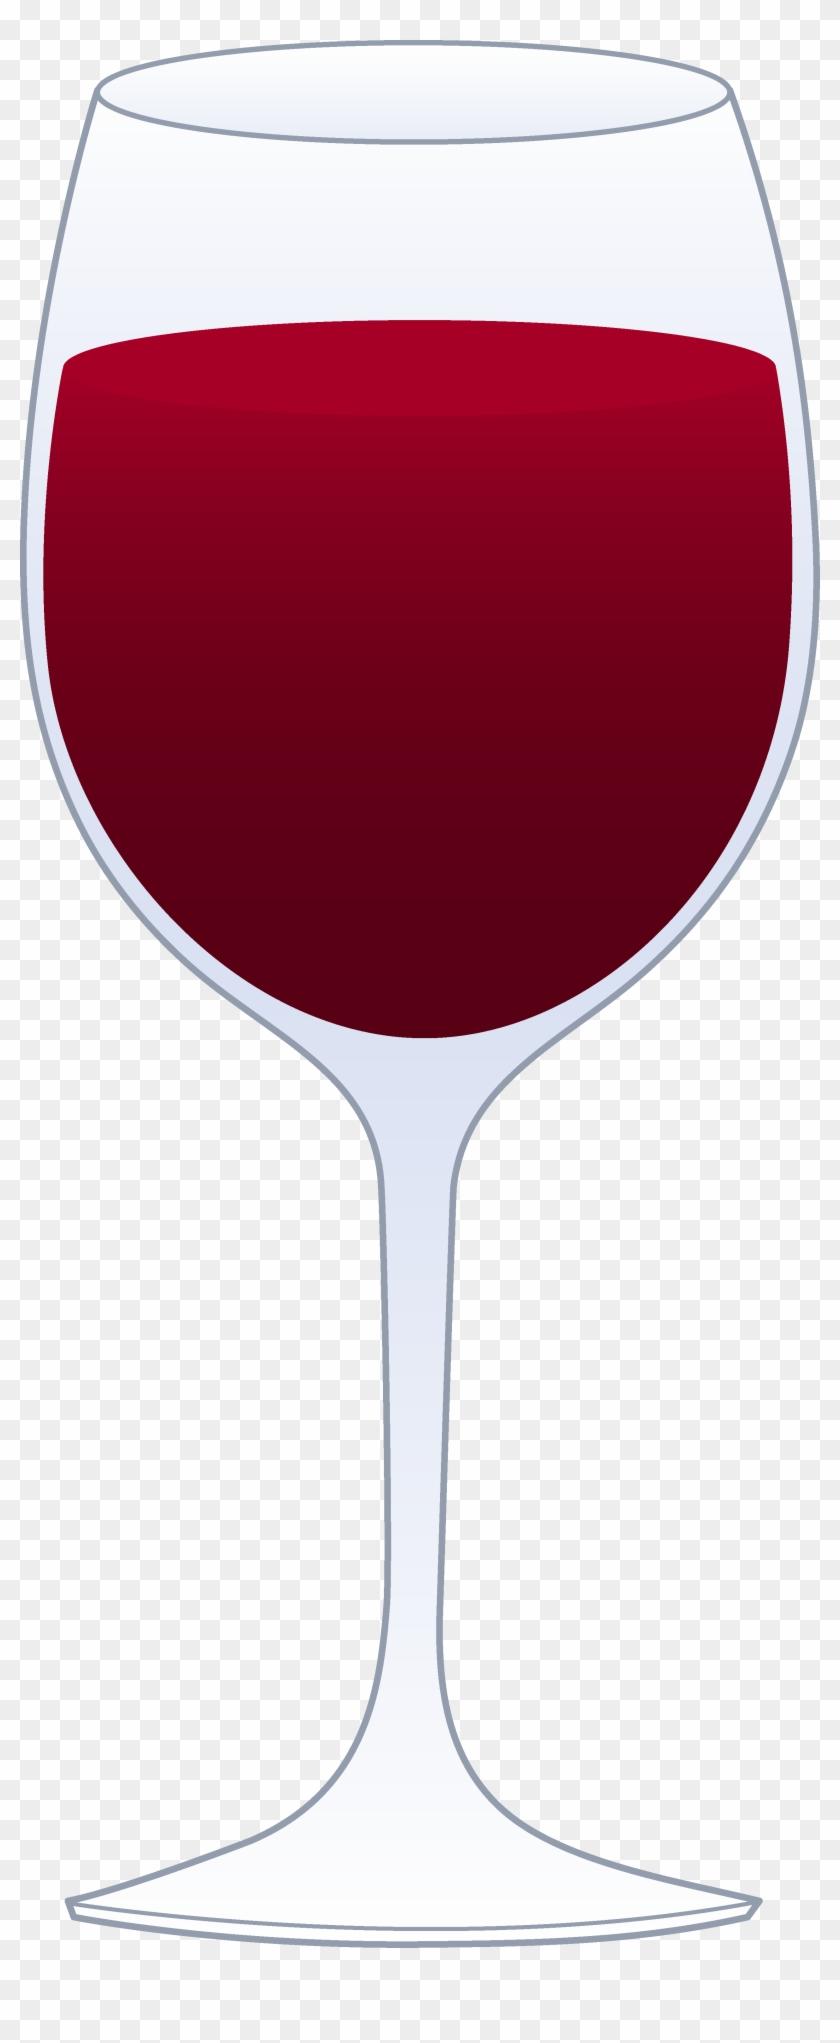 Wine Clip Art - Red Wine Glass Clip Art #57836